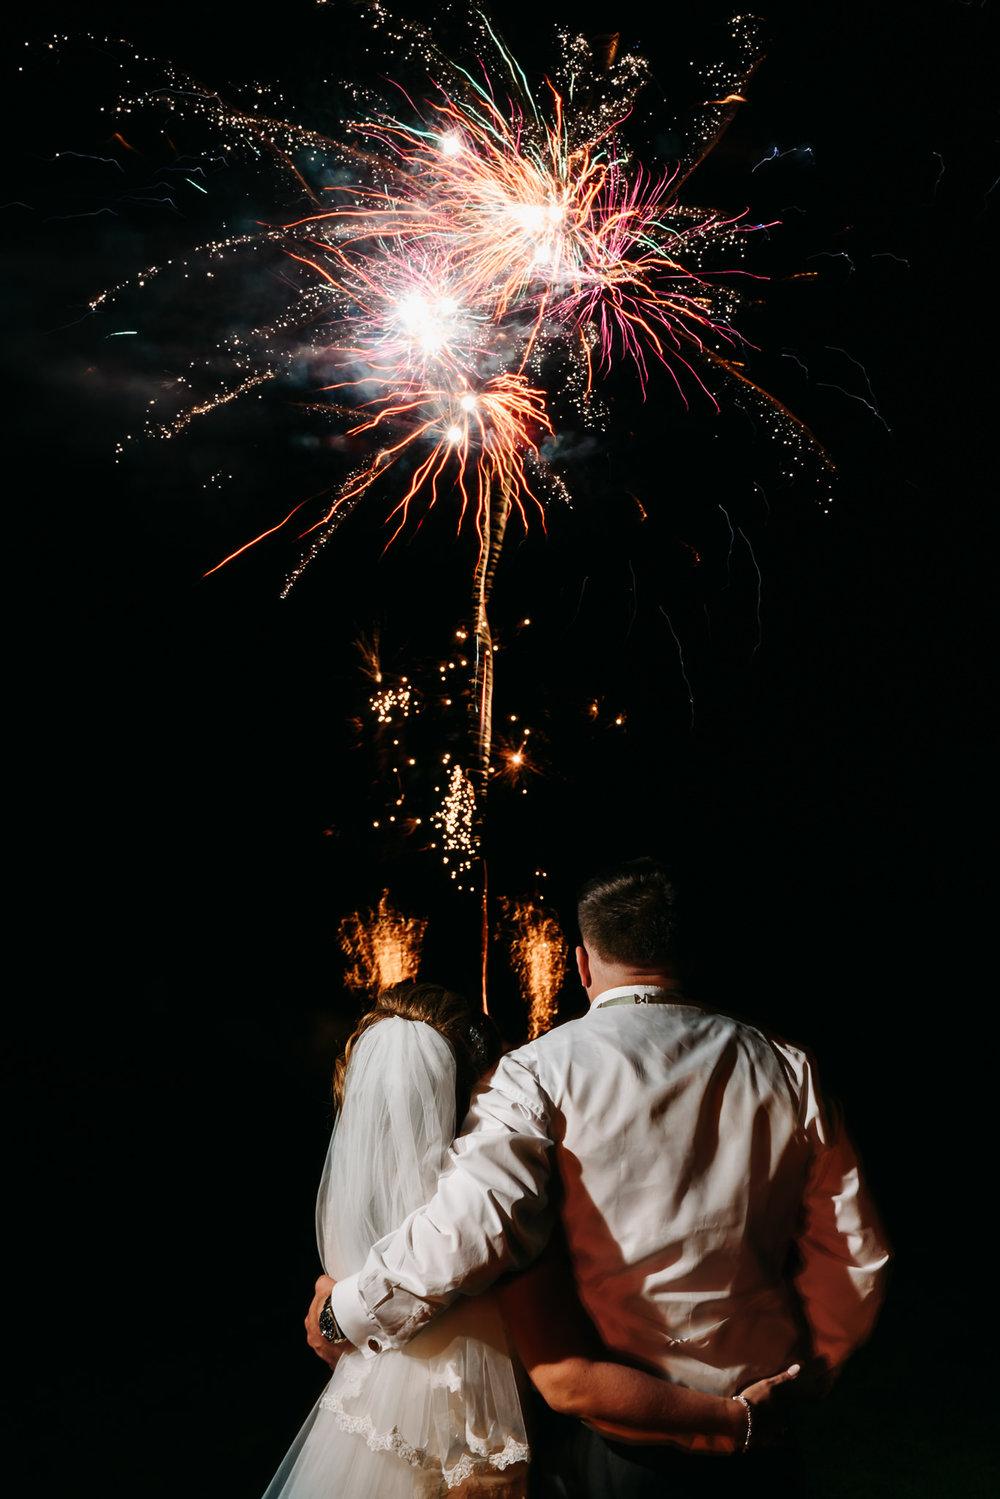 Best Of Yorkshire Wedding Photography 2017 - Martyn Hand-72.jpg